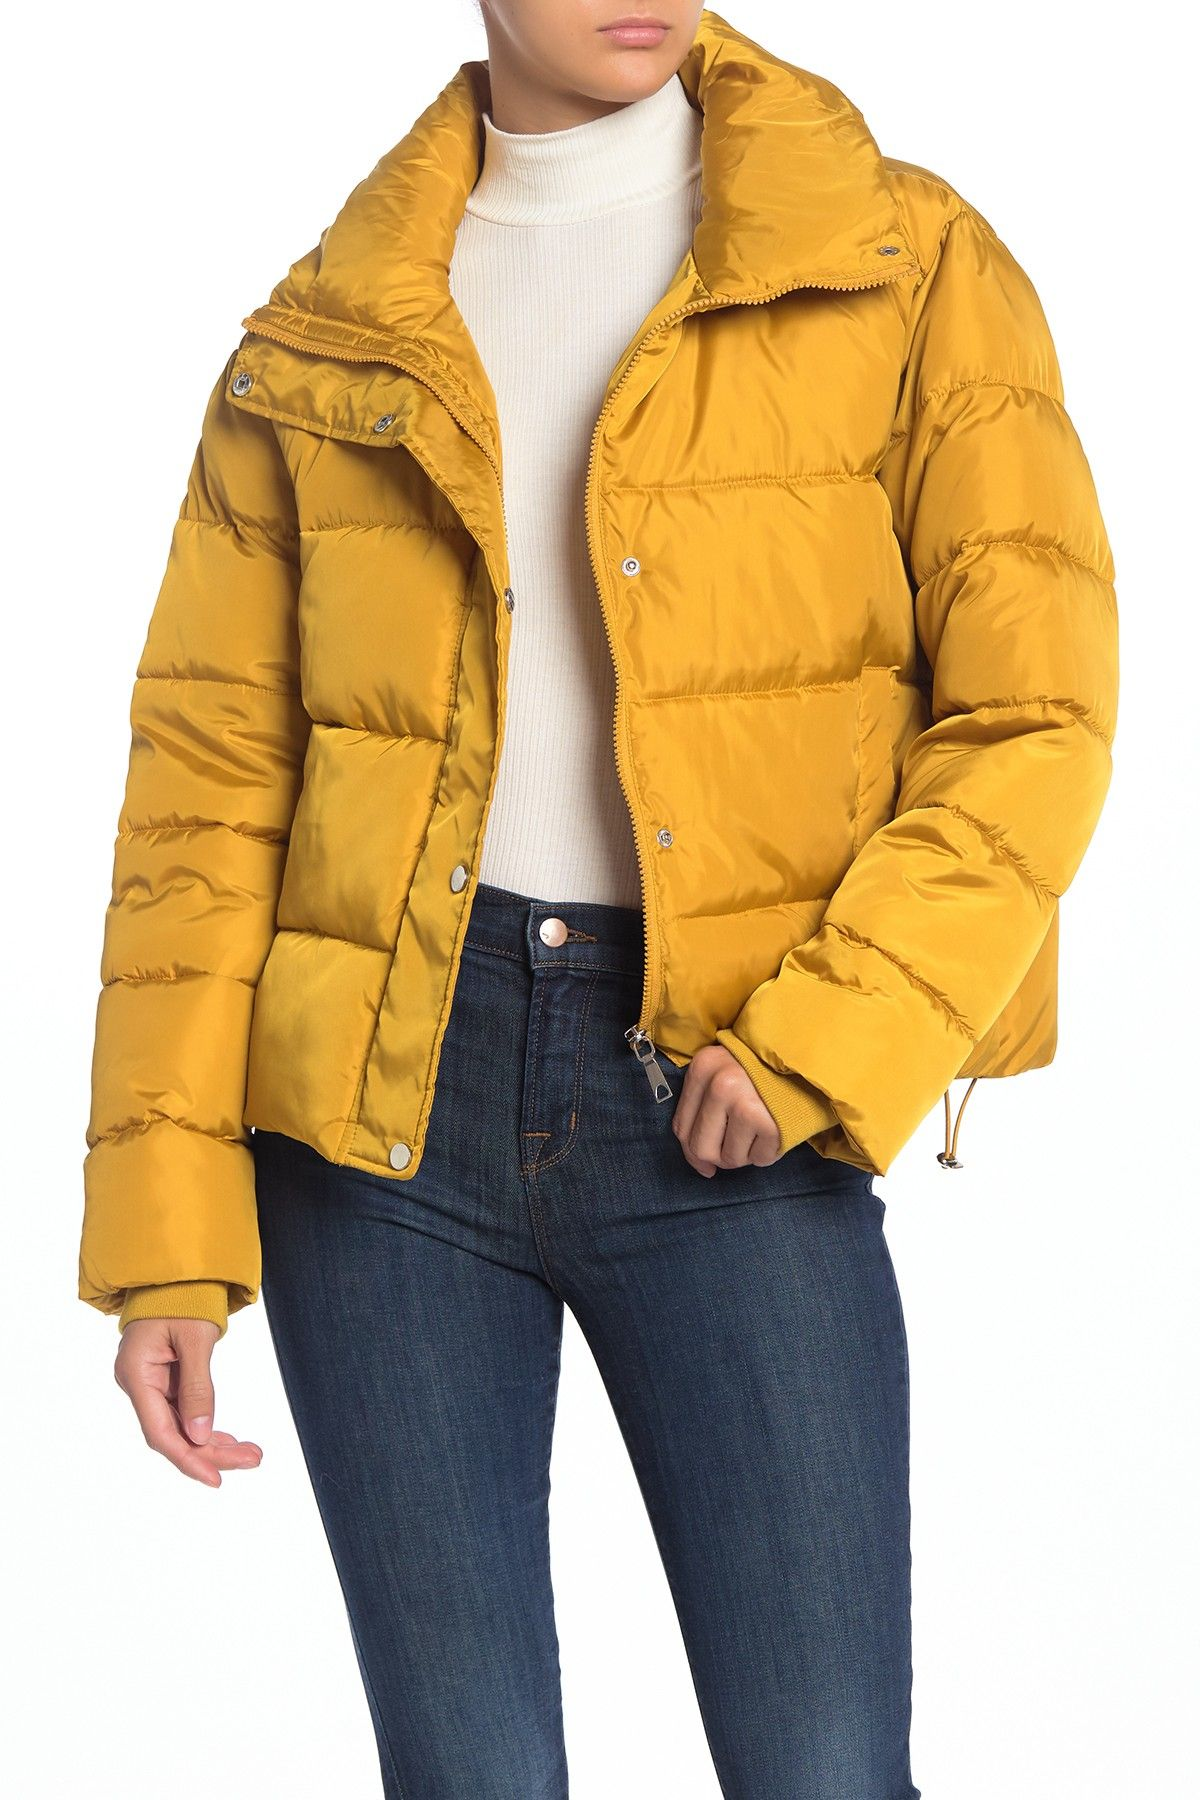 Sebby Short Fashion Puffer Nordstrom Rack Warm Puffer Jackets Fashion Jackets [ 1800 x 1200 Pixel ]